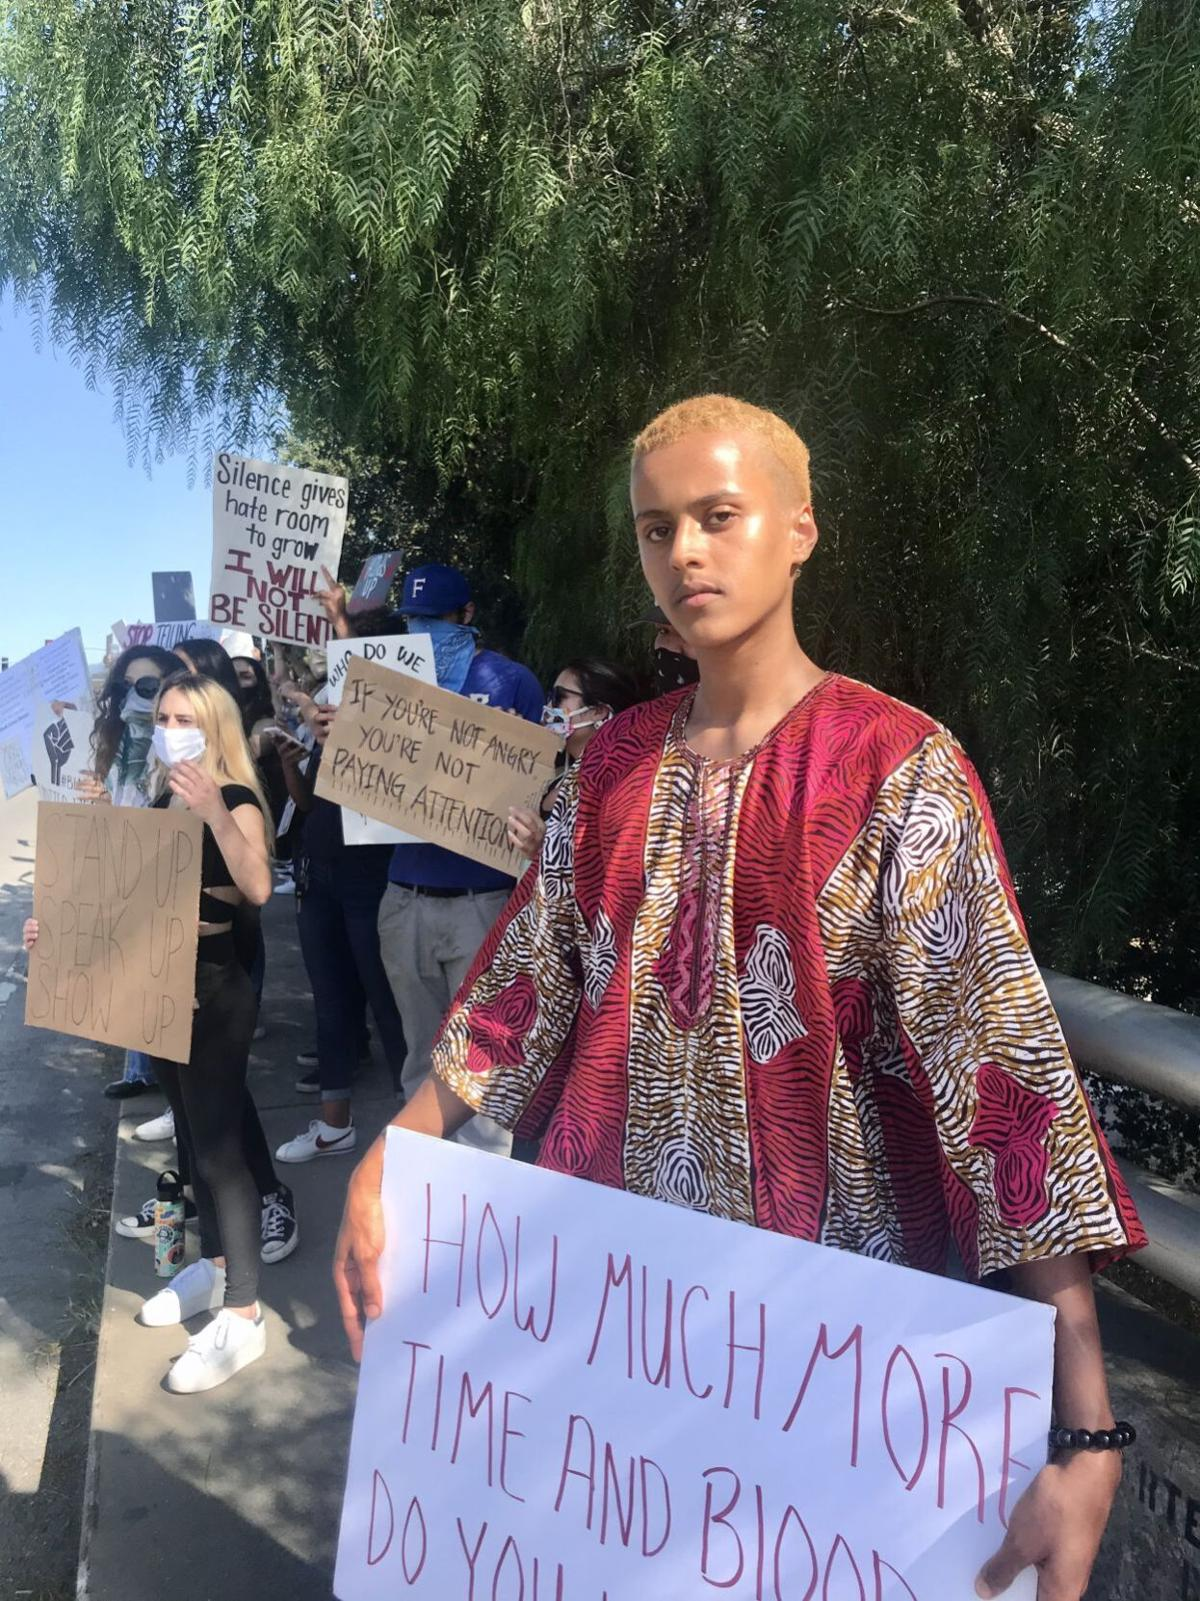 060420 Buellton Protest 24